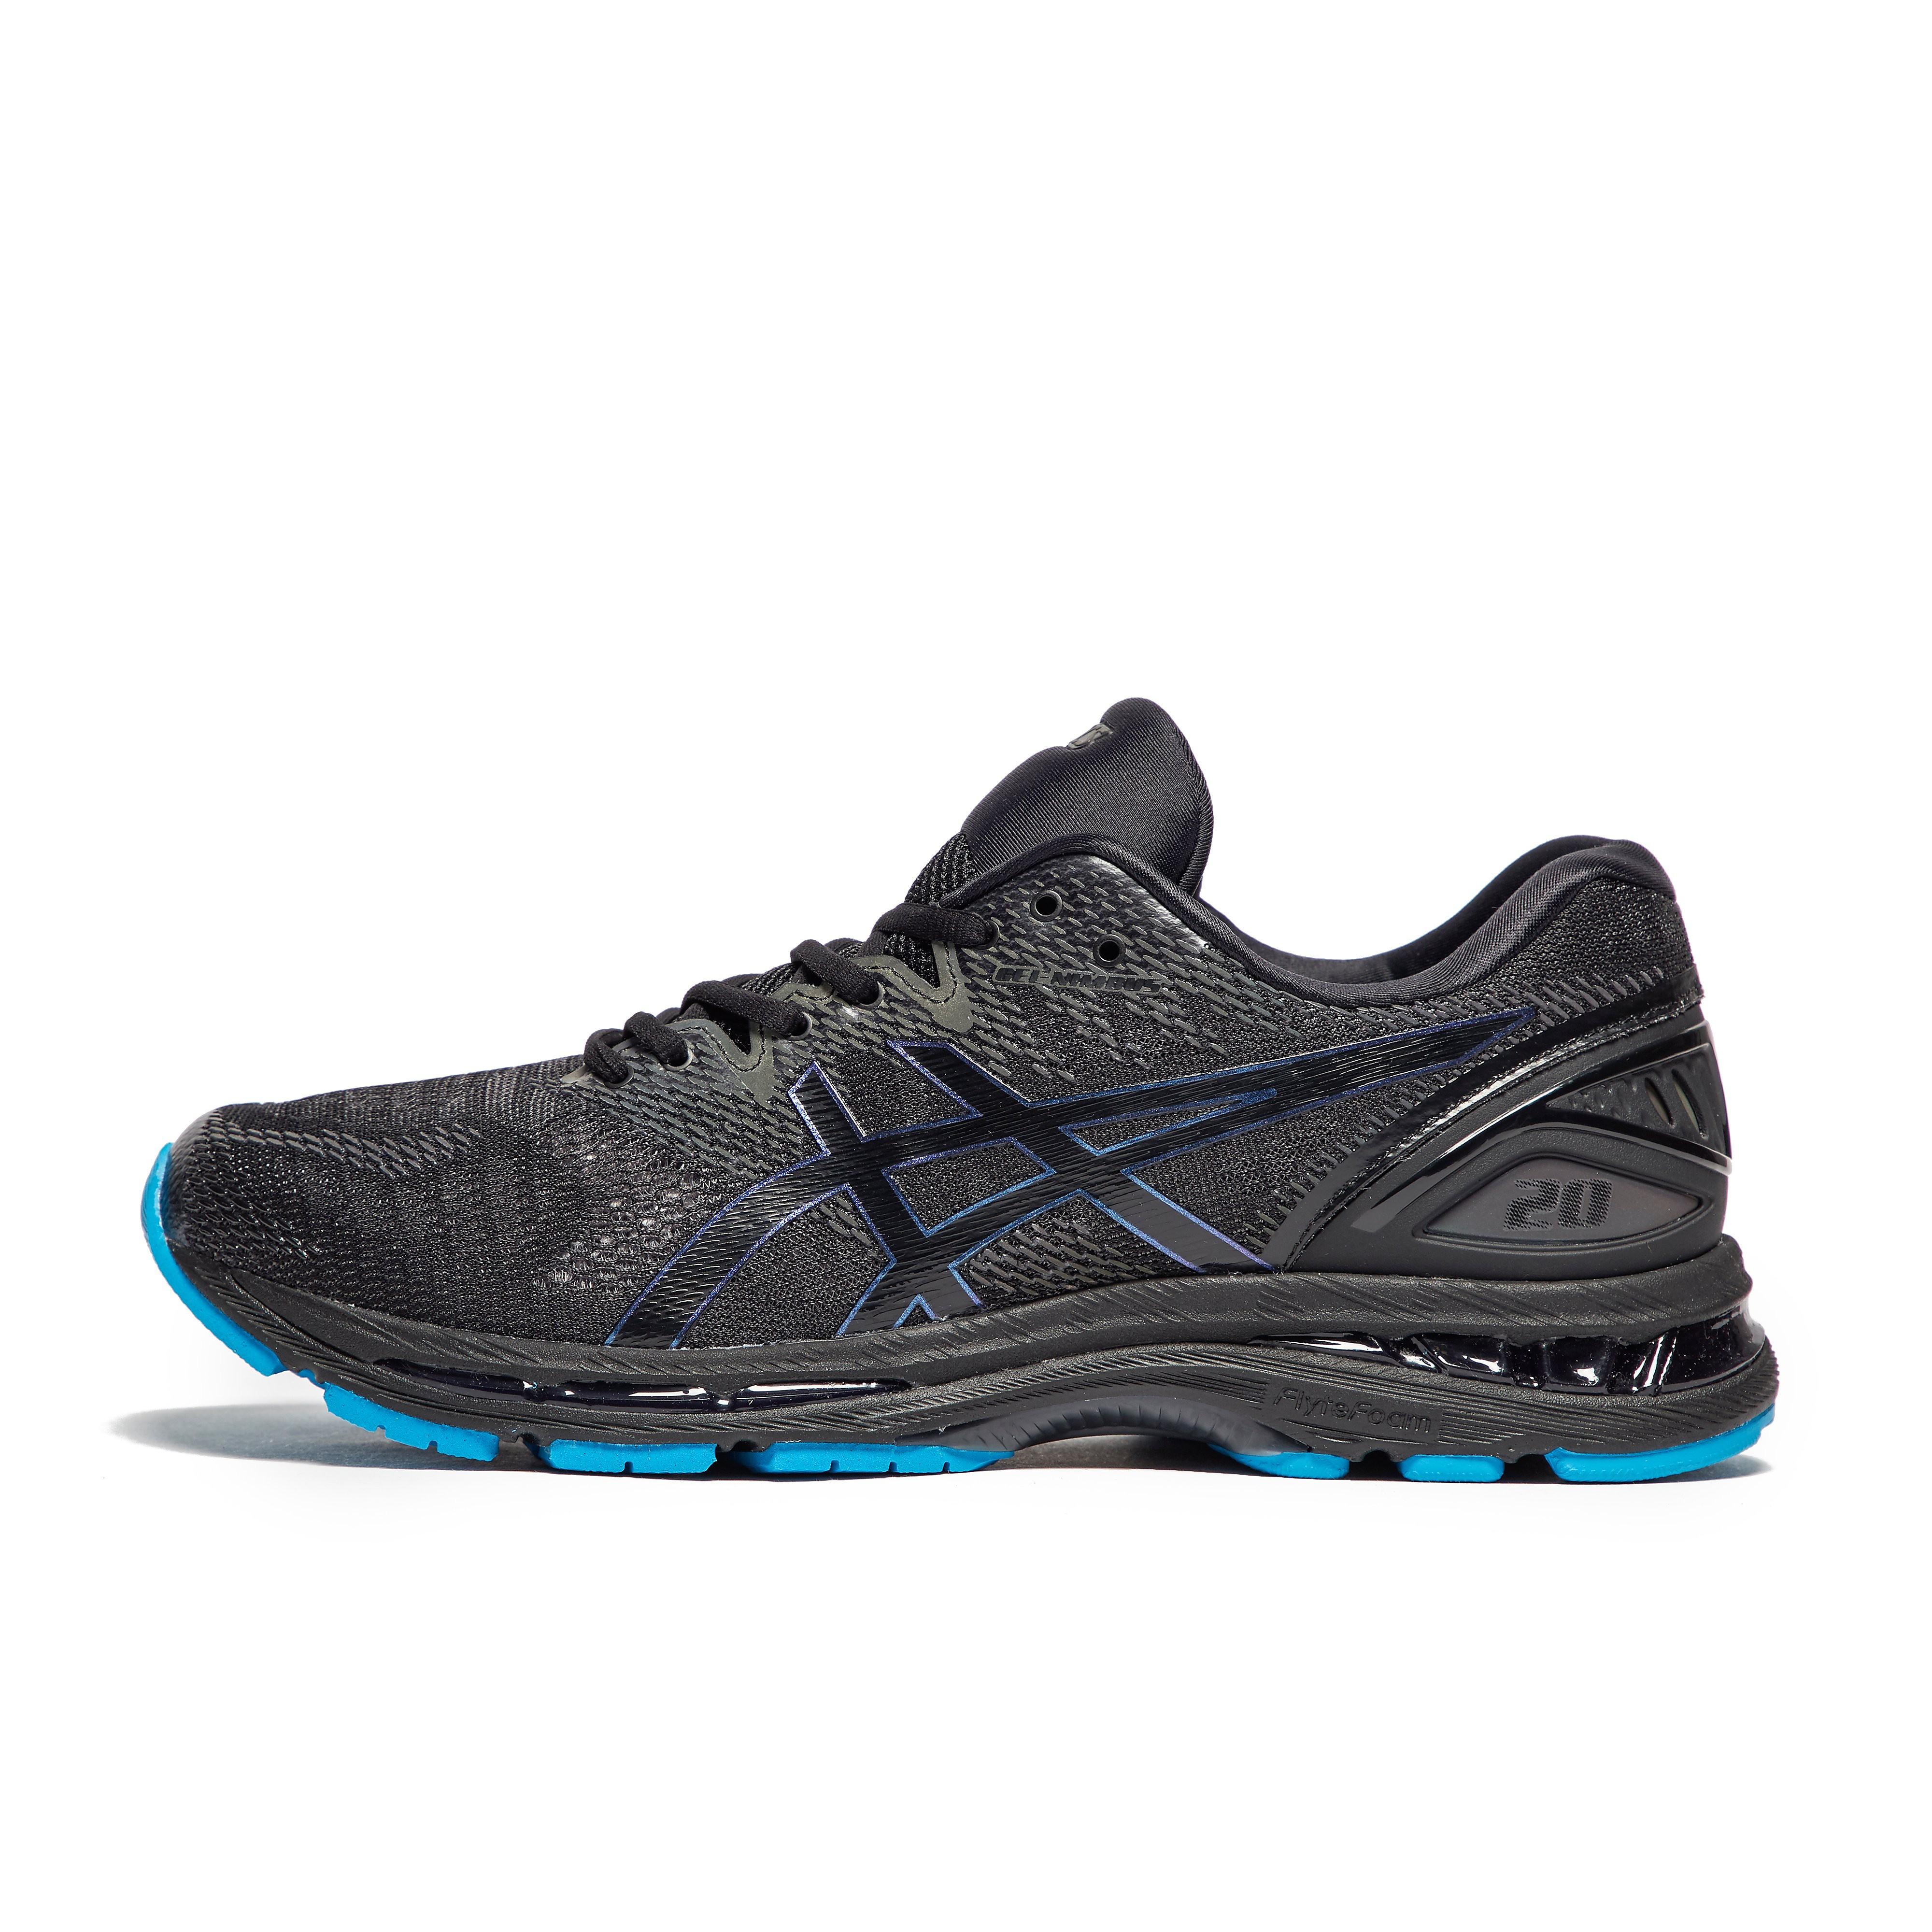 Mens Black ASICS Gel-Nimbus 20 Lite-Show Running Shoes